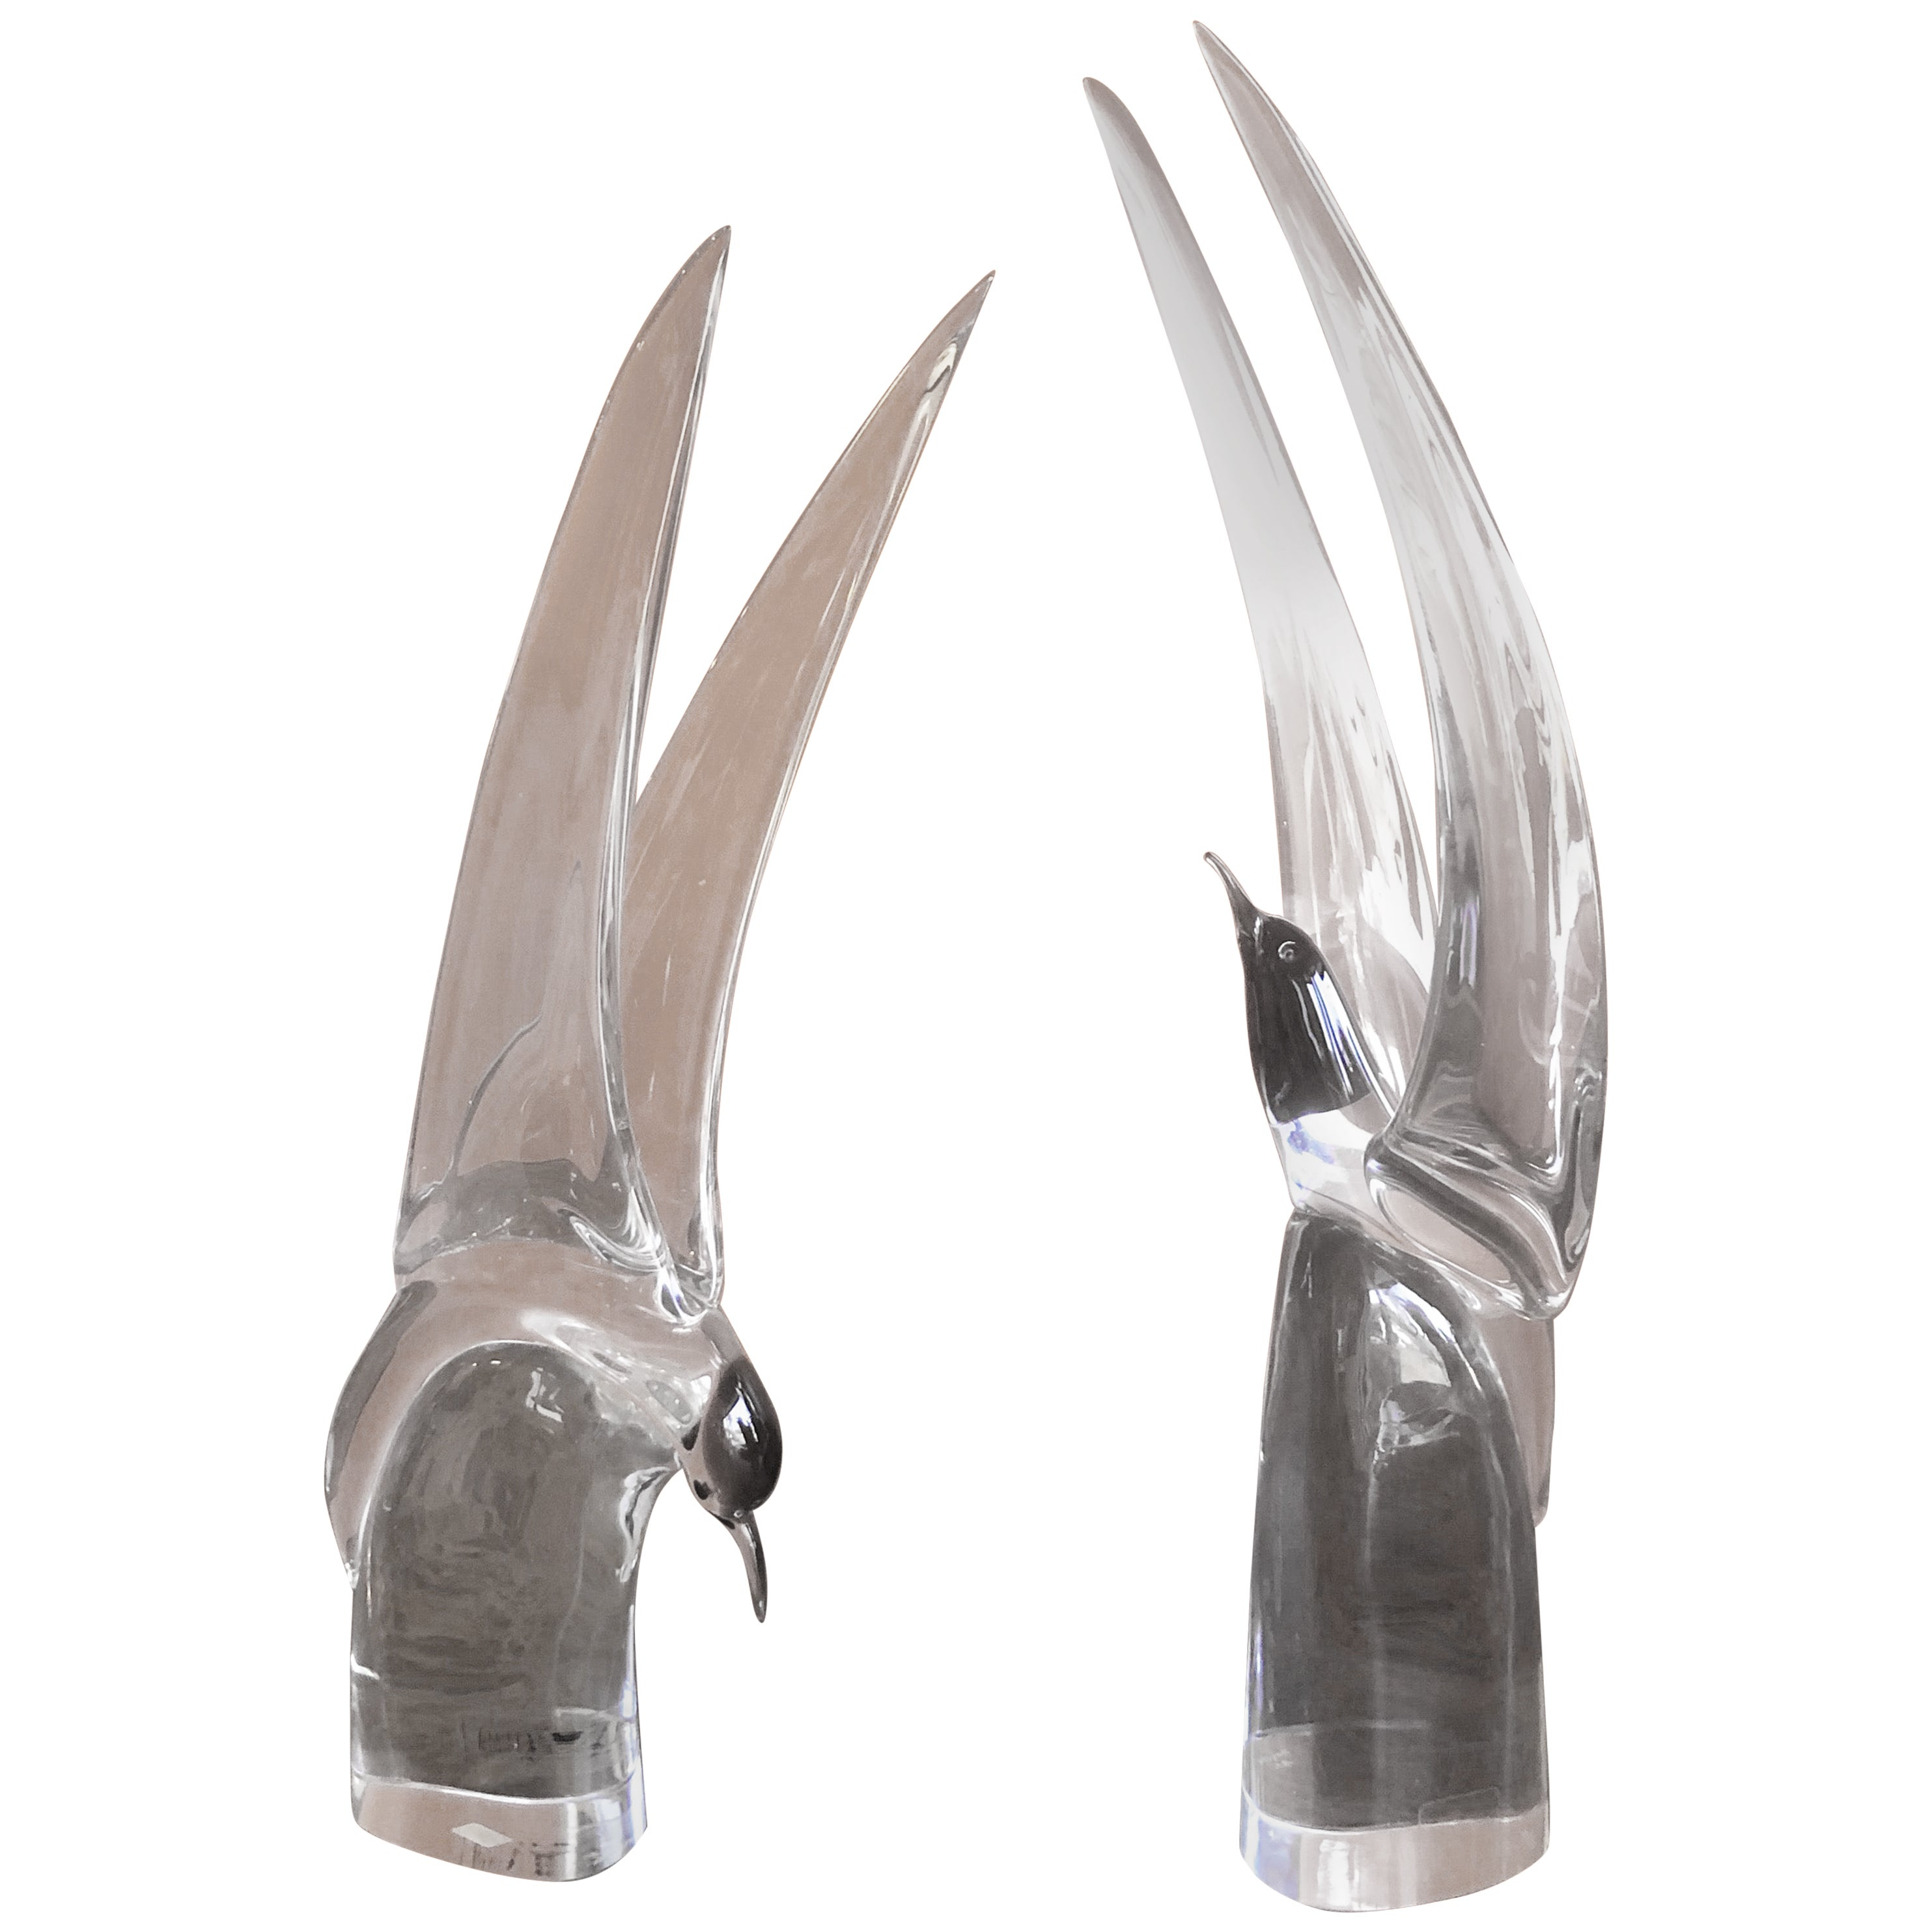 Pair of Art Glass Terns/Sea Gulls by Livio Seguso for Murano Glass Studios